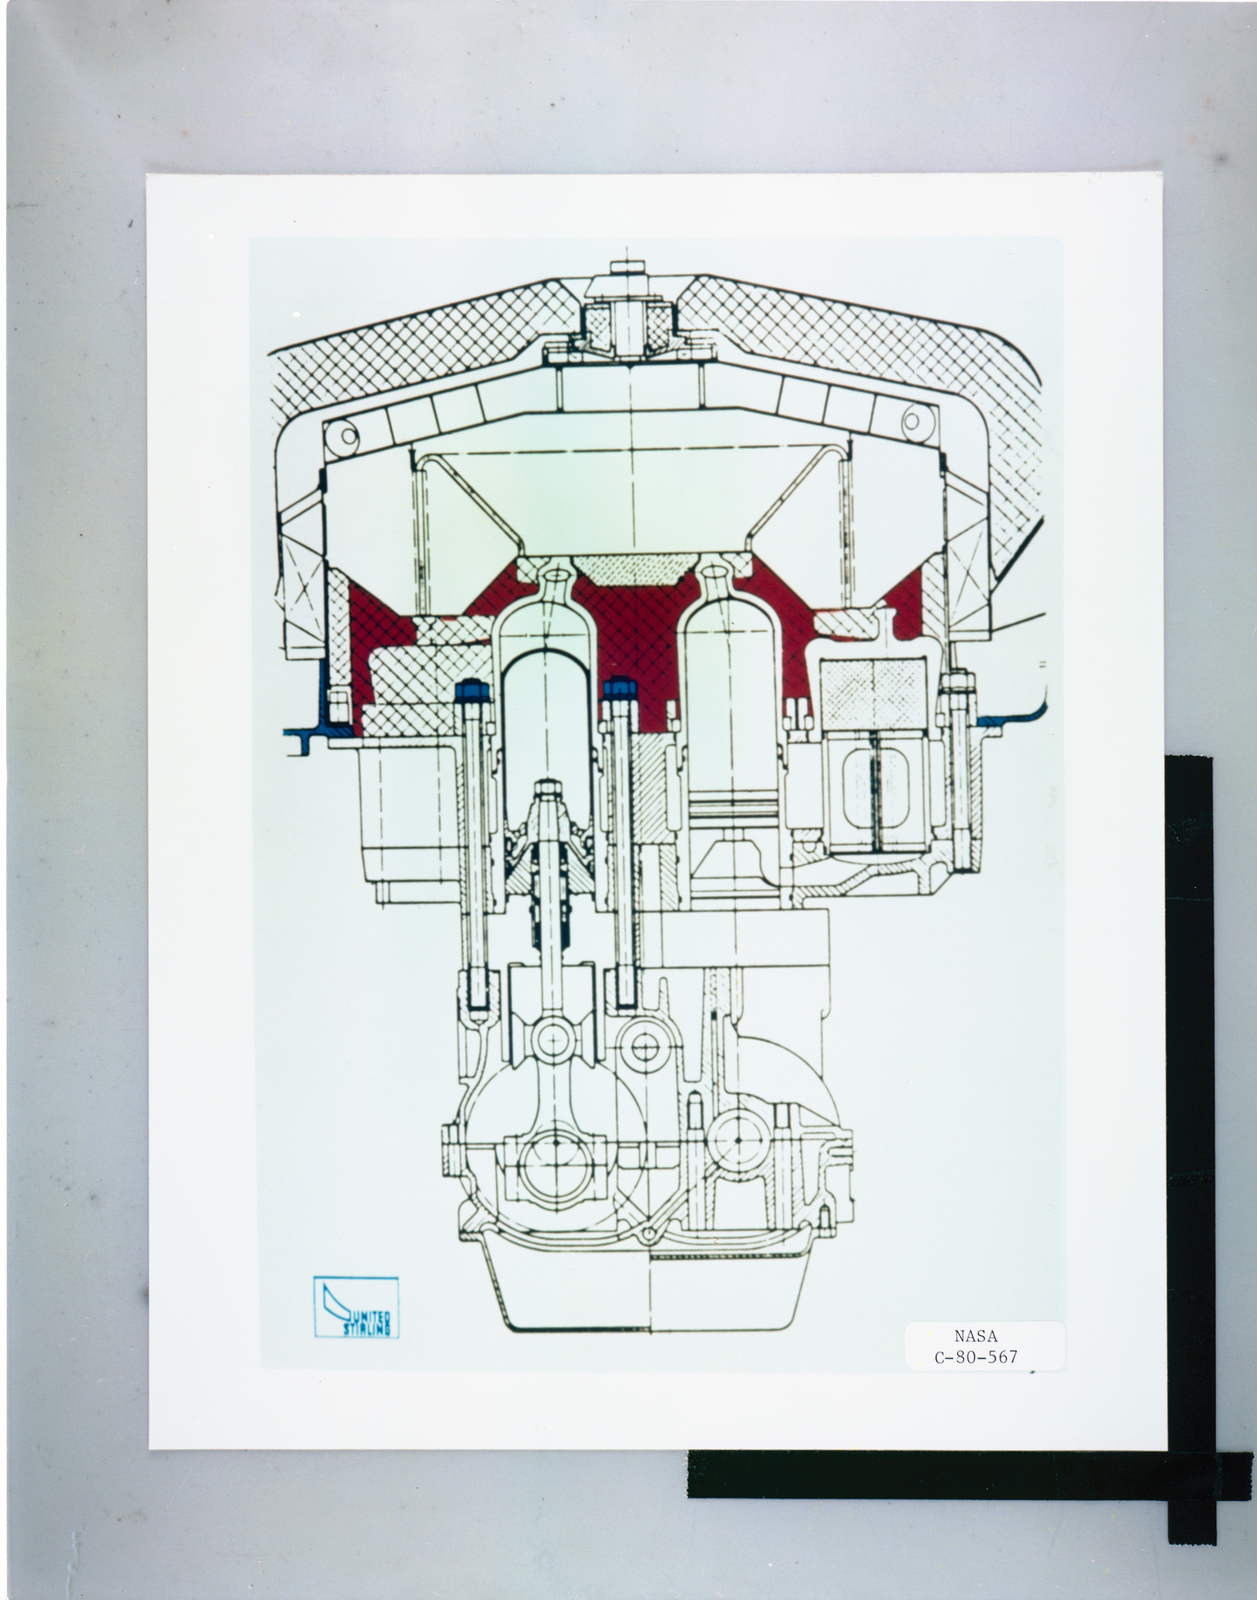 MOD-1 STIRLING ENGINE - U S  National Archives Public Domain